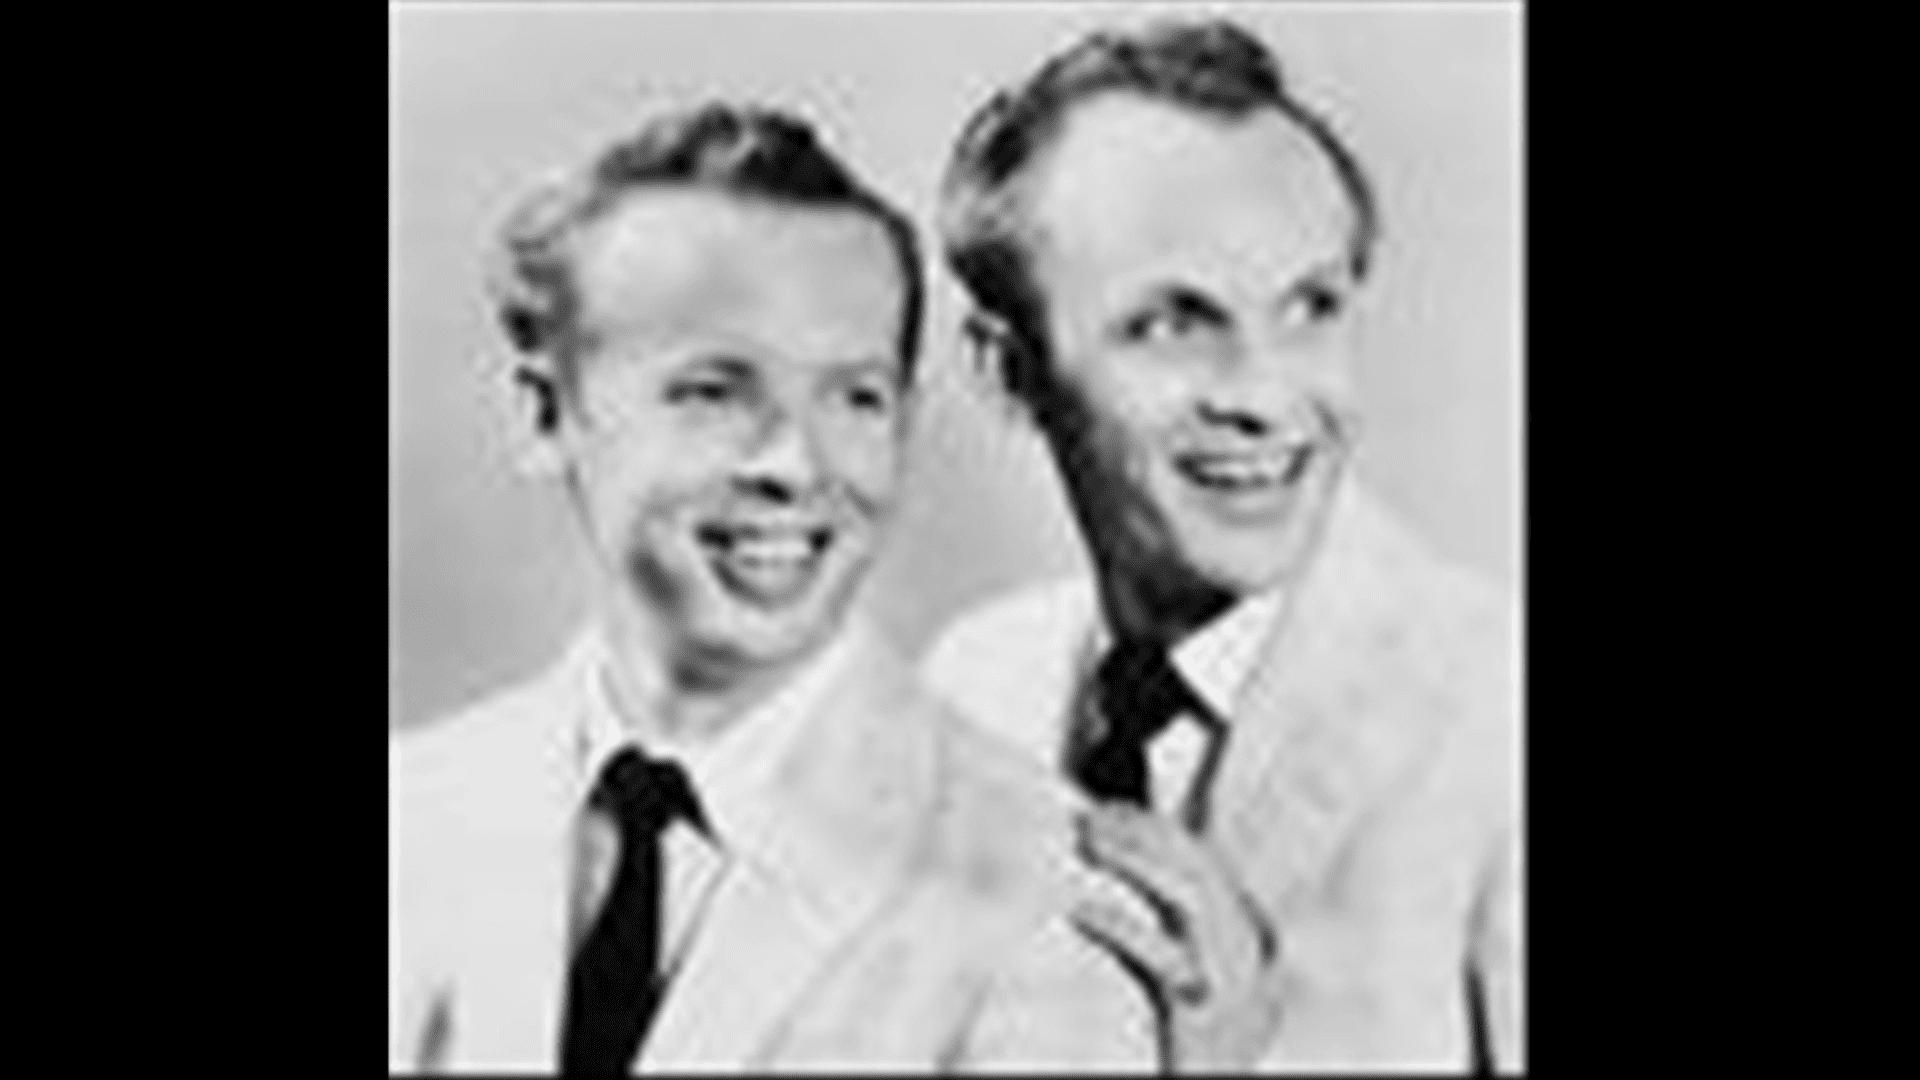 Christian Life, Louvin Brothers